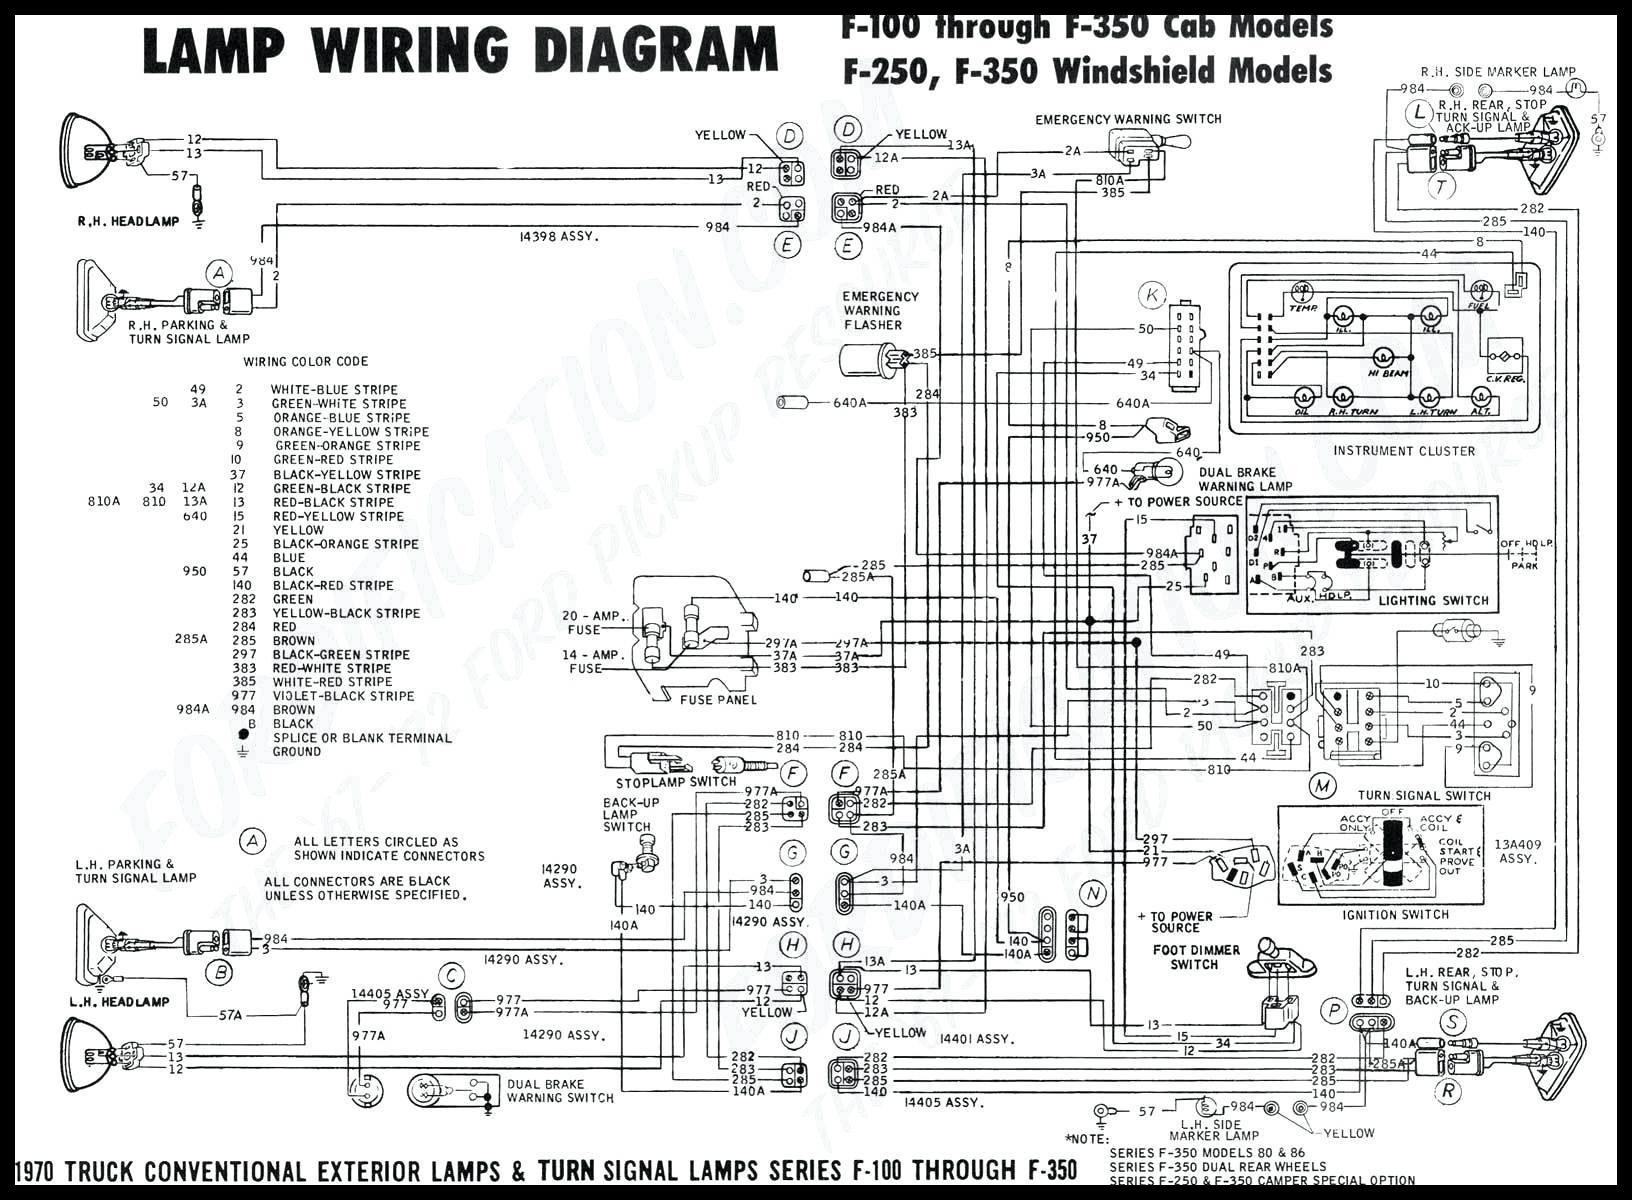 2000 chevy silverado fuel pump wiring diagram book of chevy rh zookastar Toyota Fuel Pump Problems Toyota Fuel Pump Relay Location